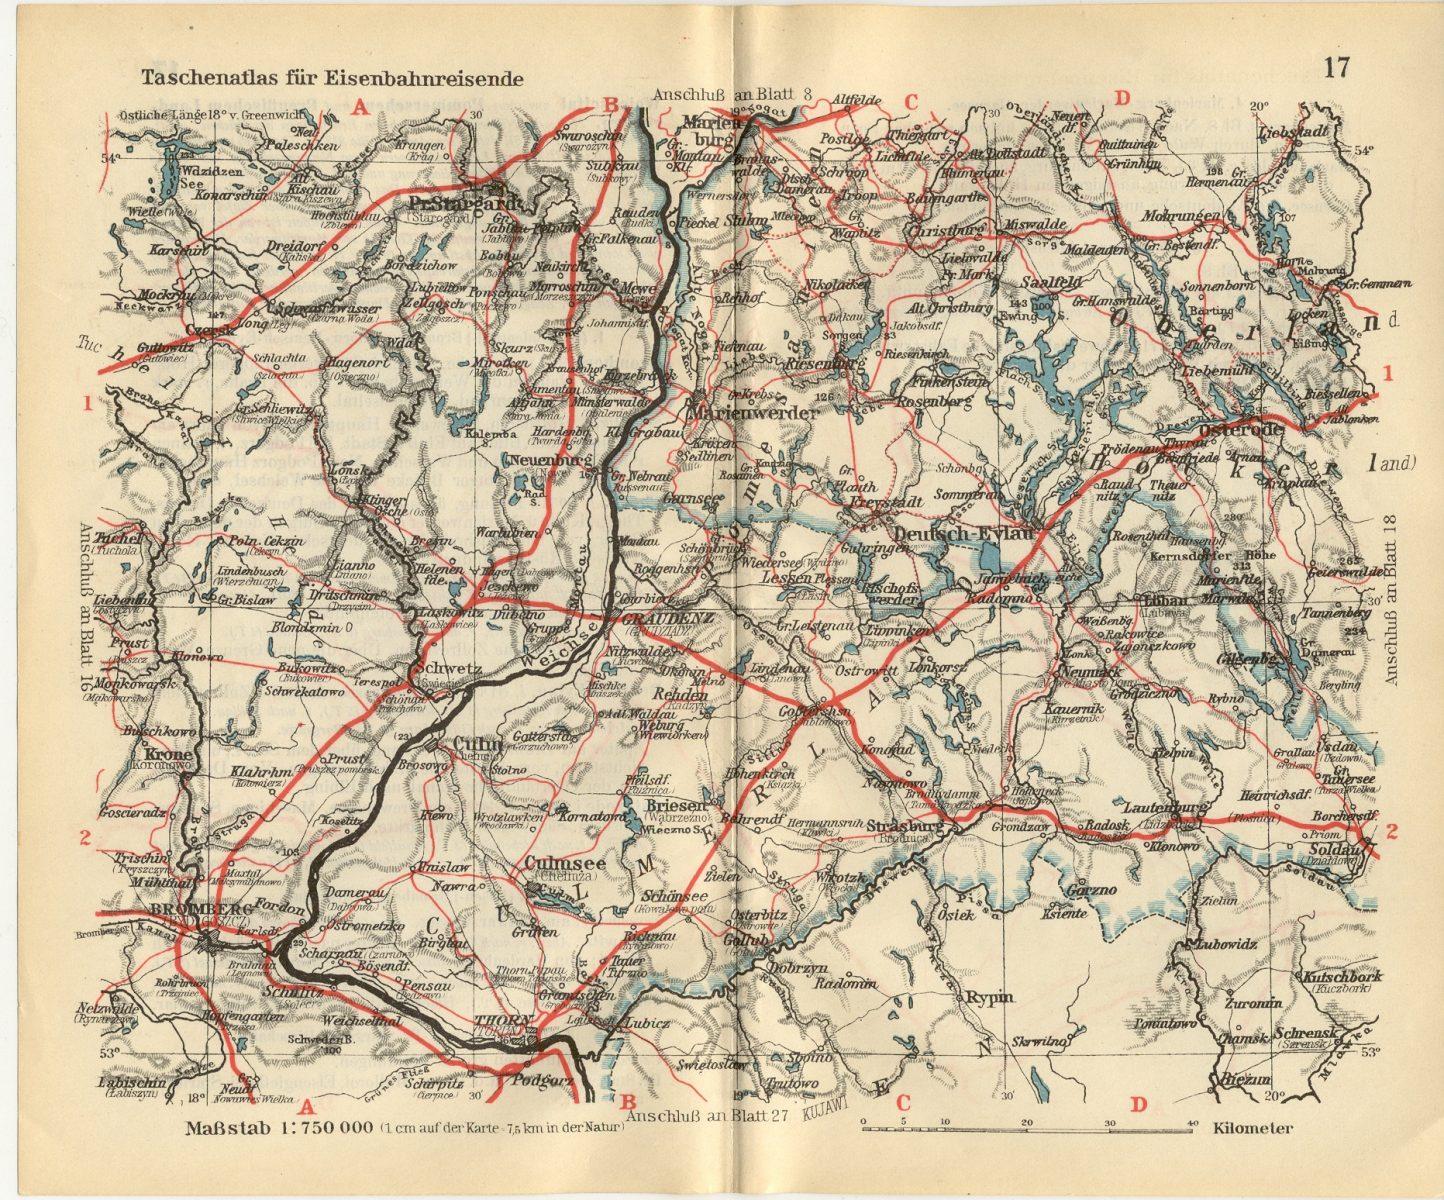 Eisenbahnkarte Culmsee Taschenatlas 1925